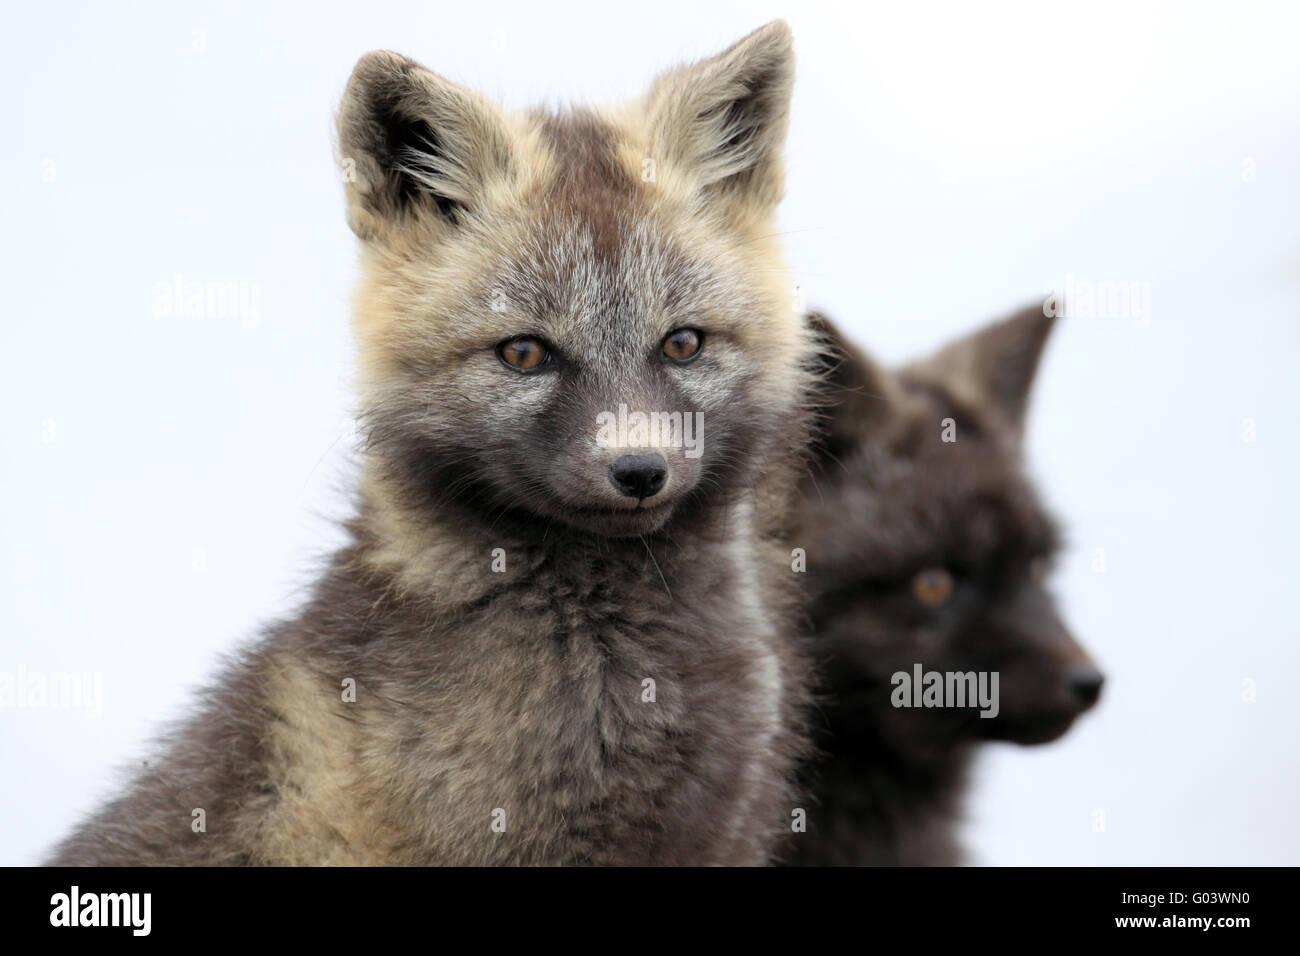 Silber Phase Red Fox Silberfuchs Stockbild